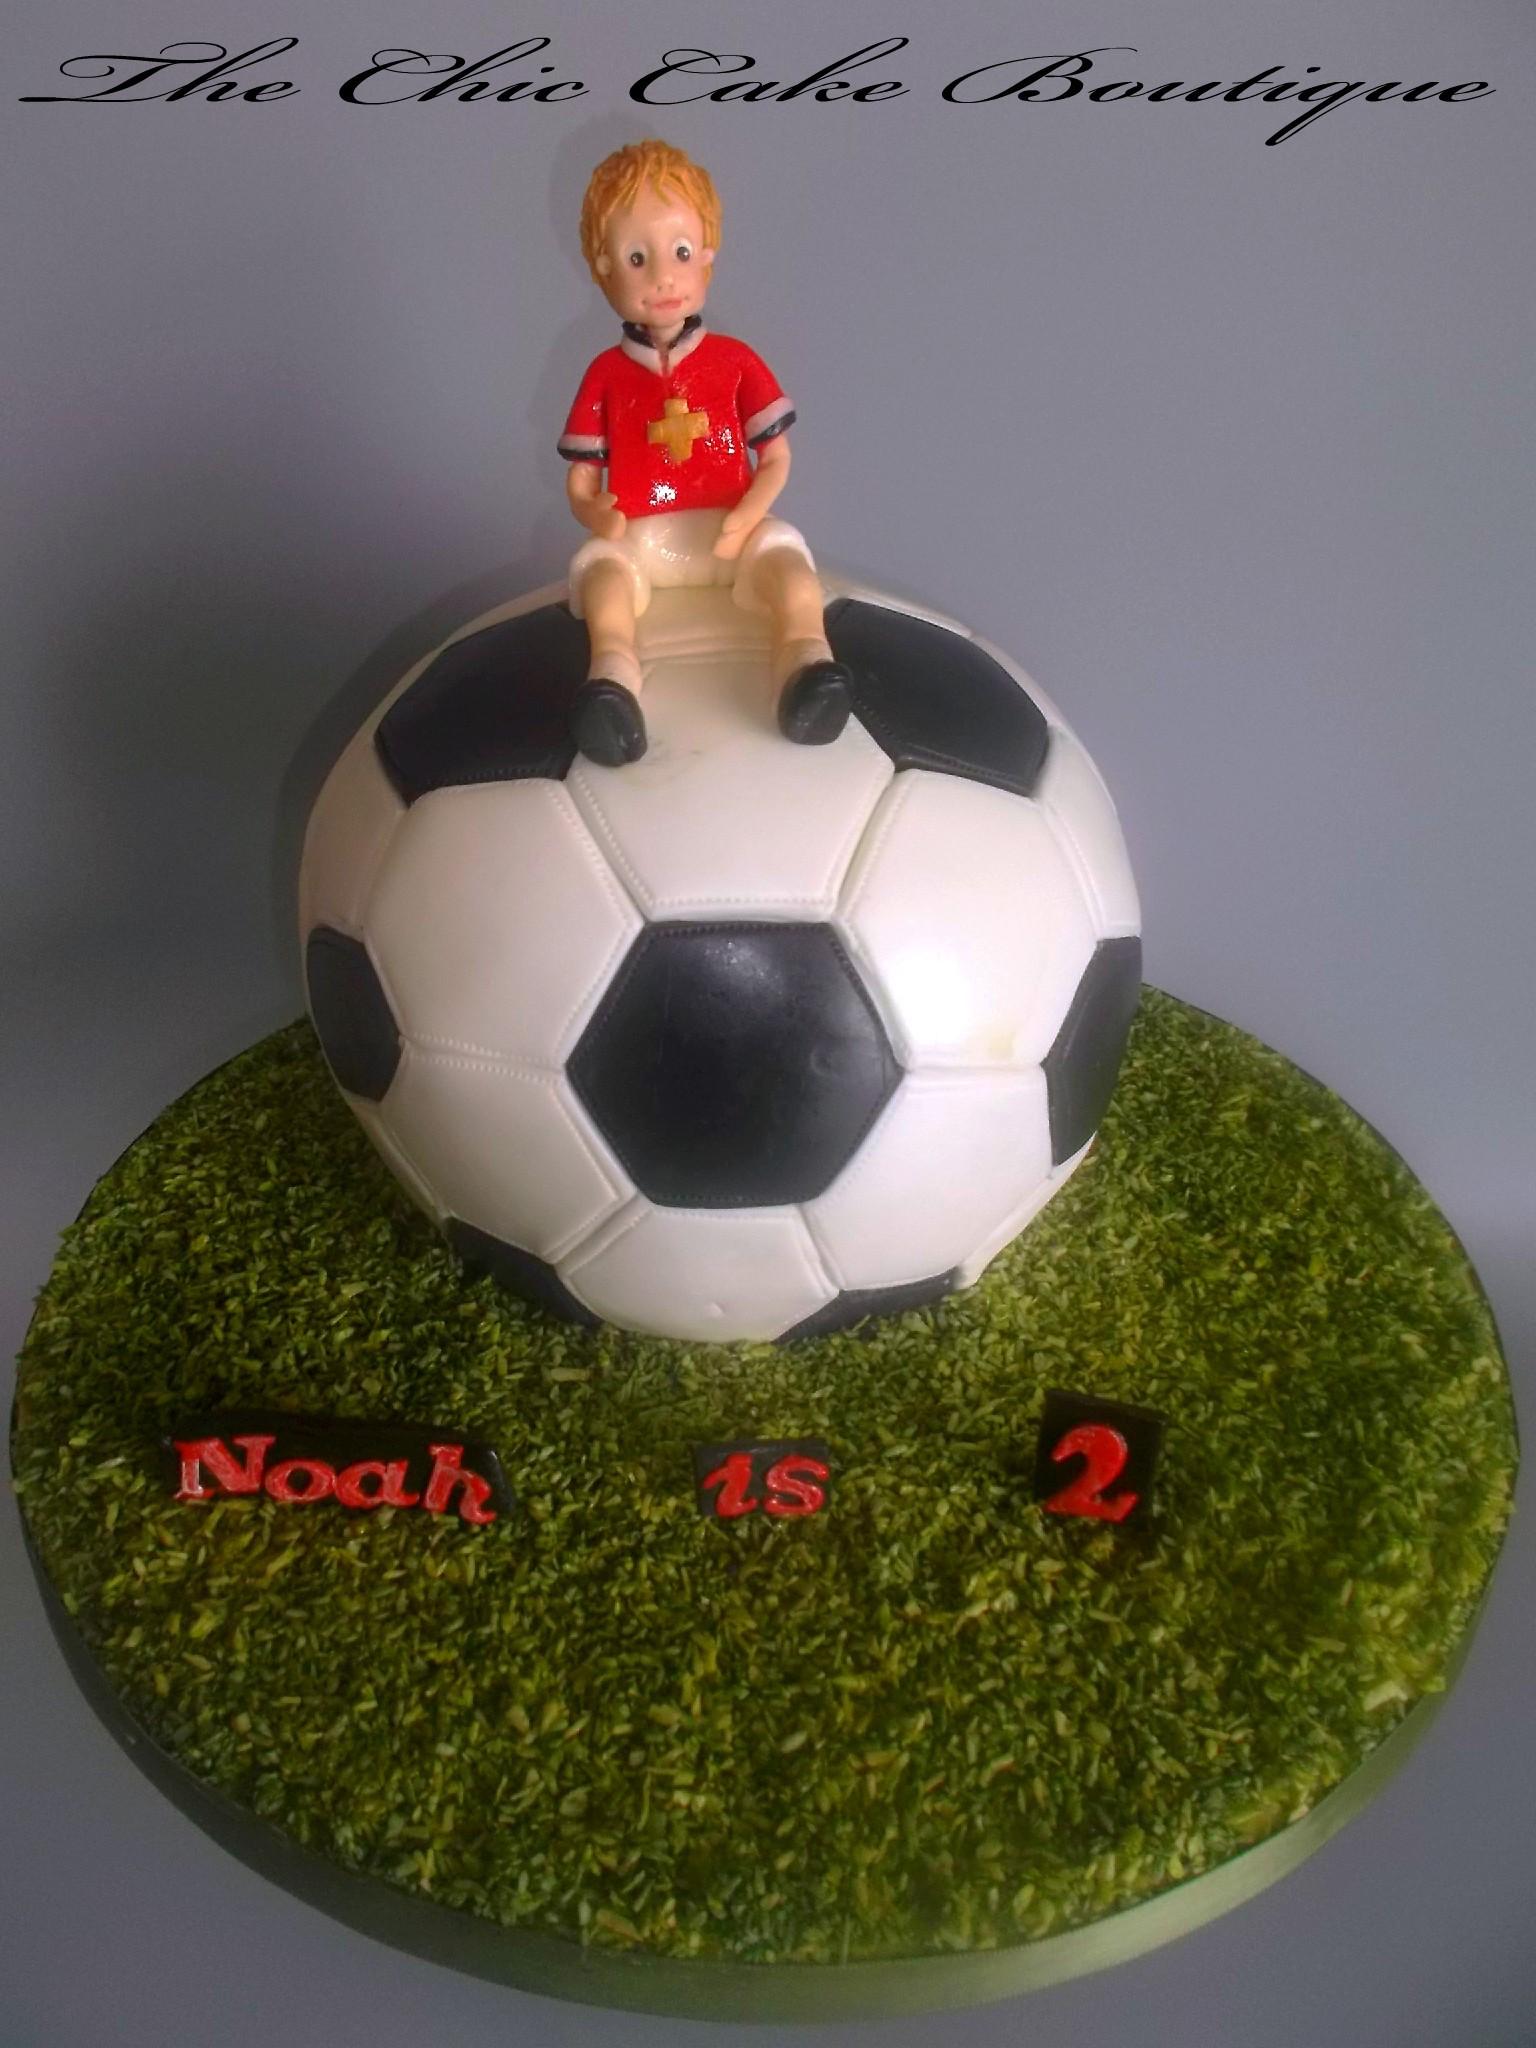 ball-noah-cake